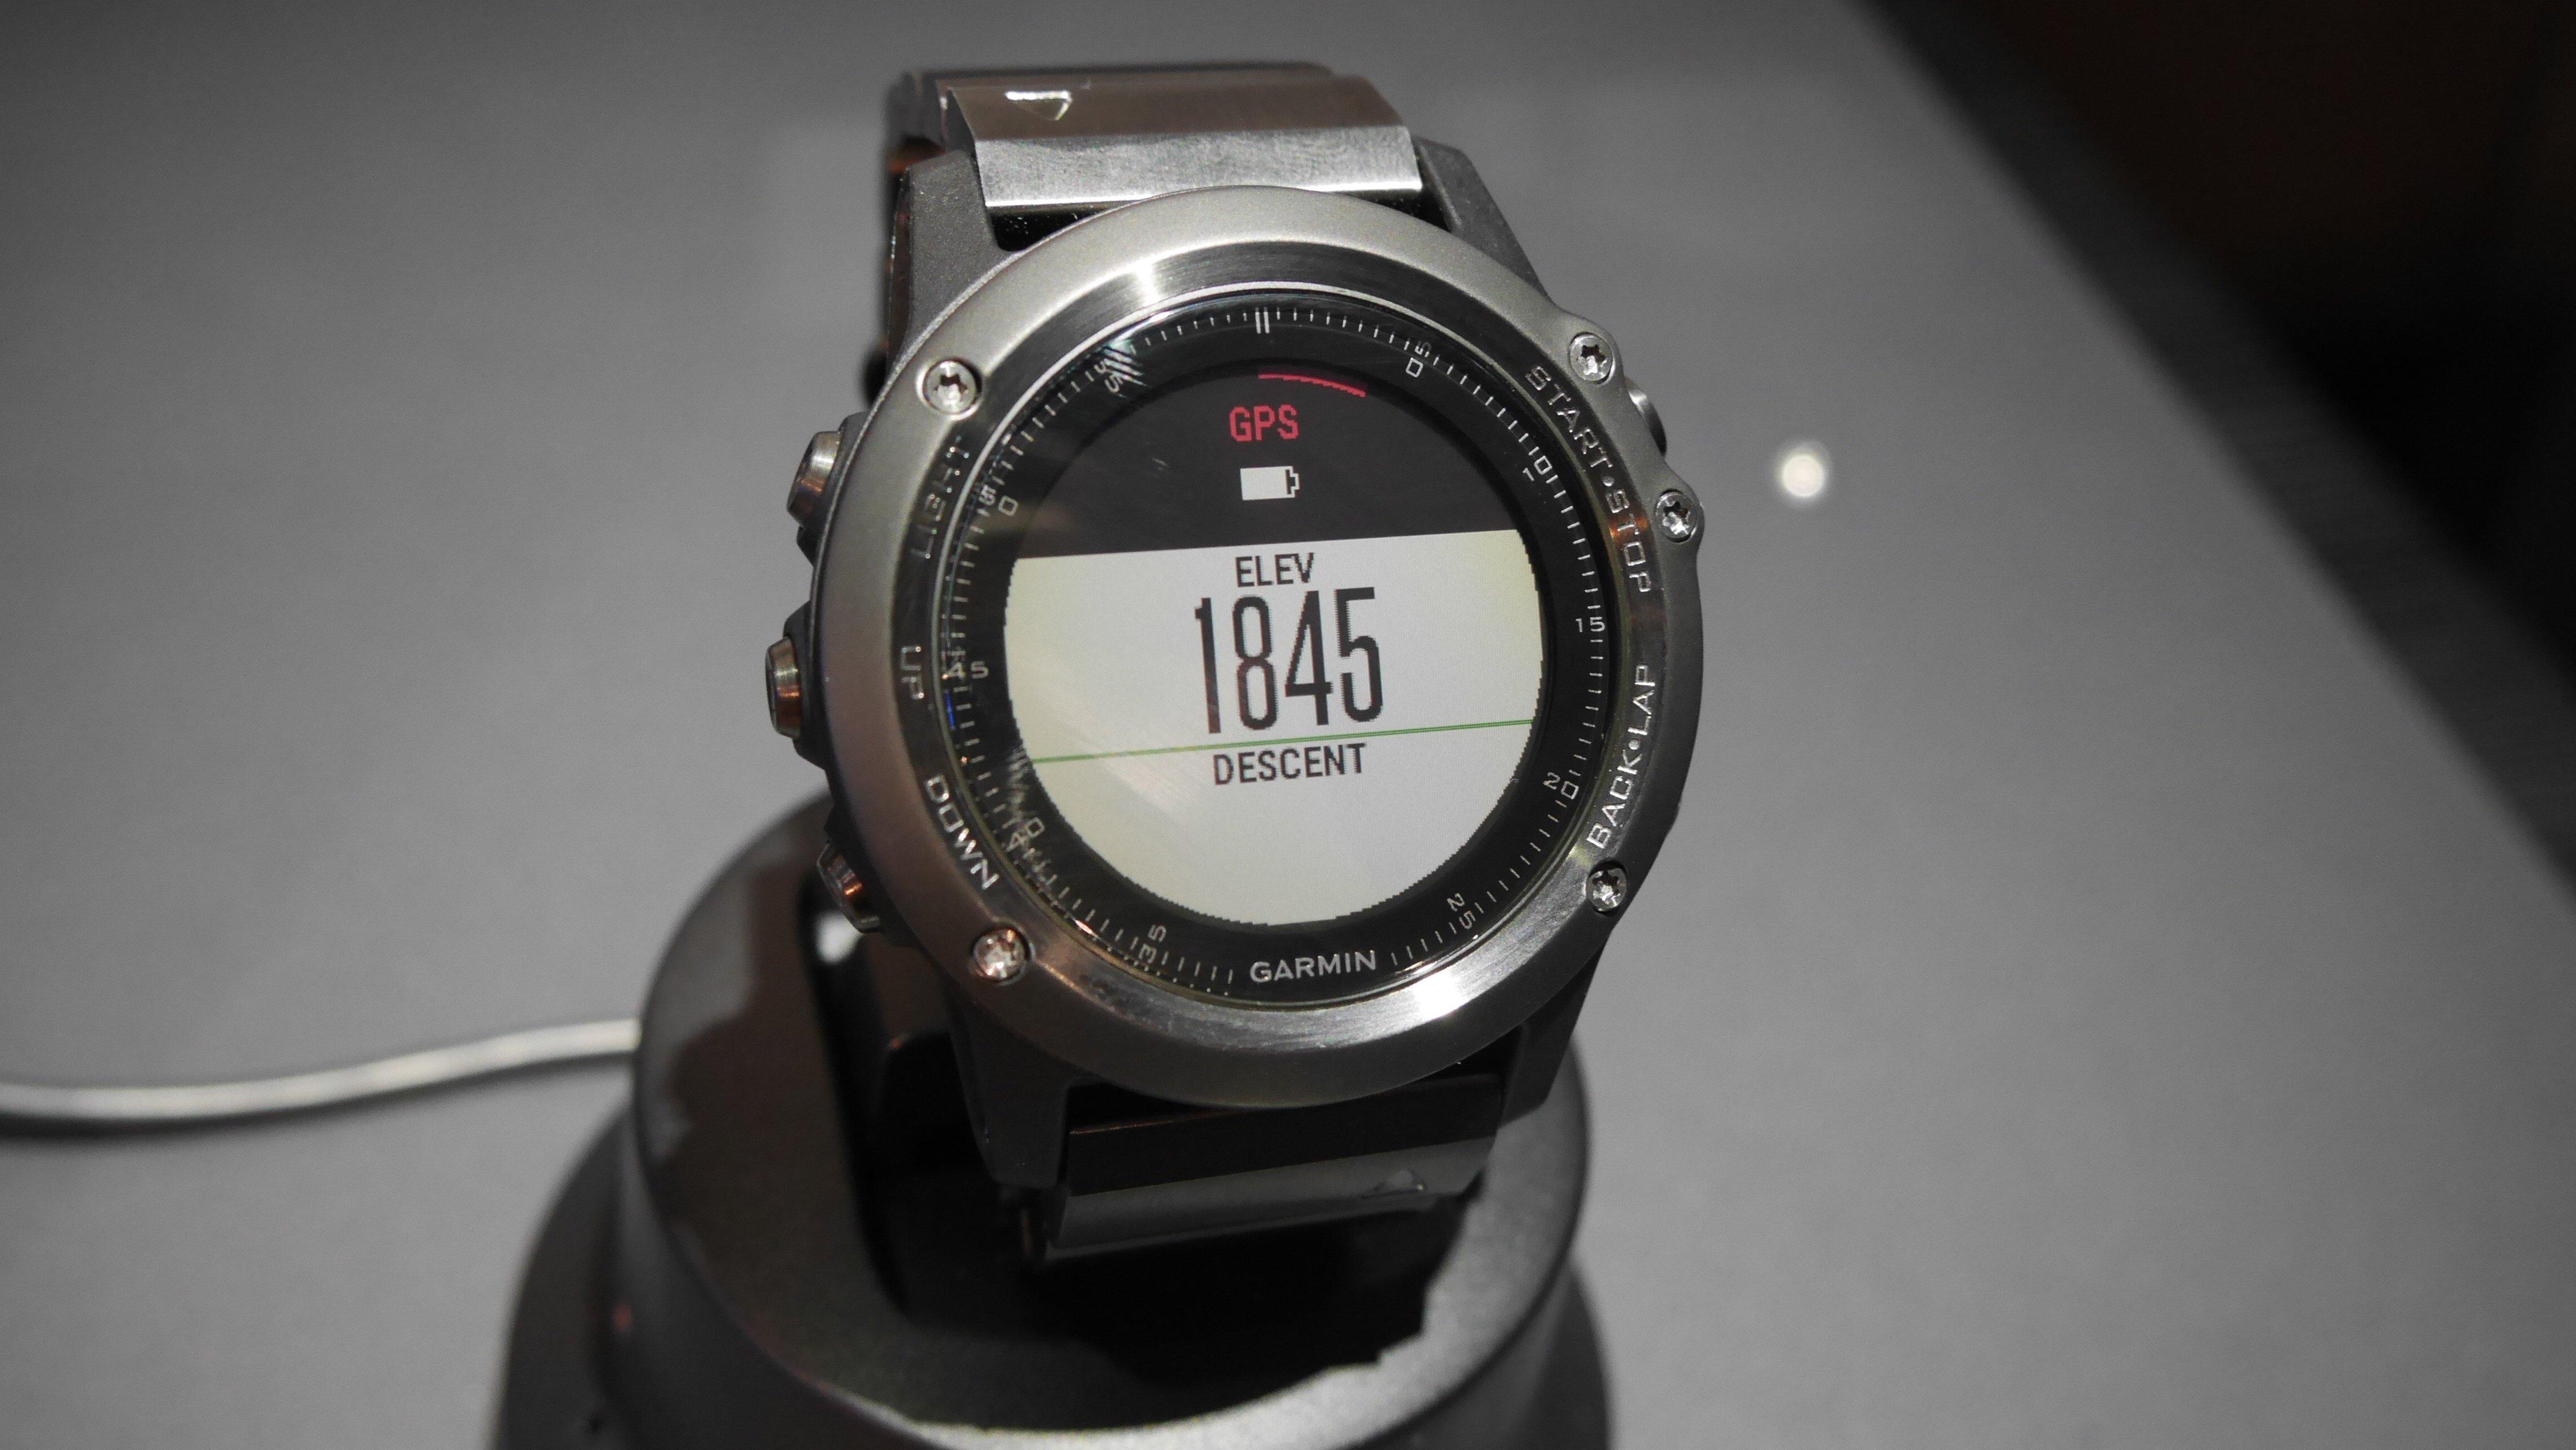 Epix leads the way for garmin s 2015 gps watch range expert reviews